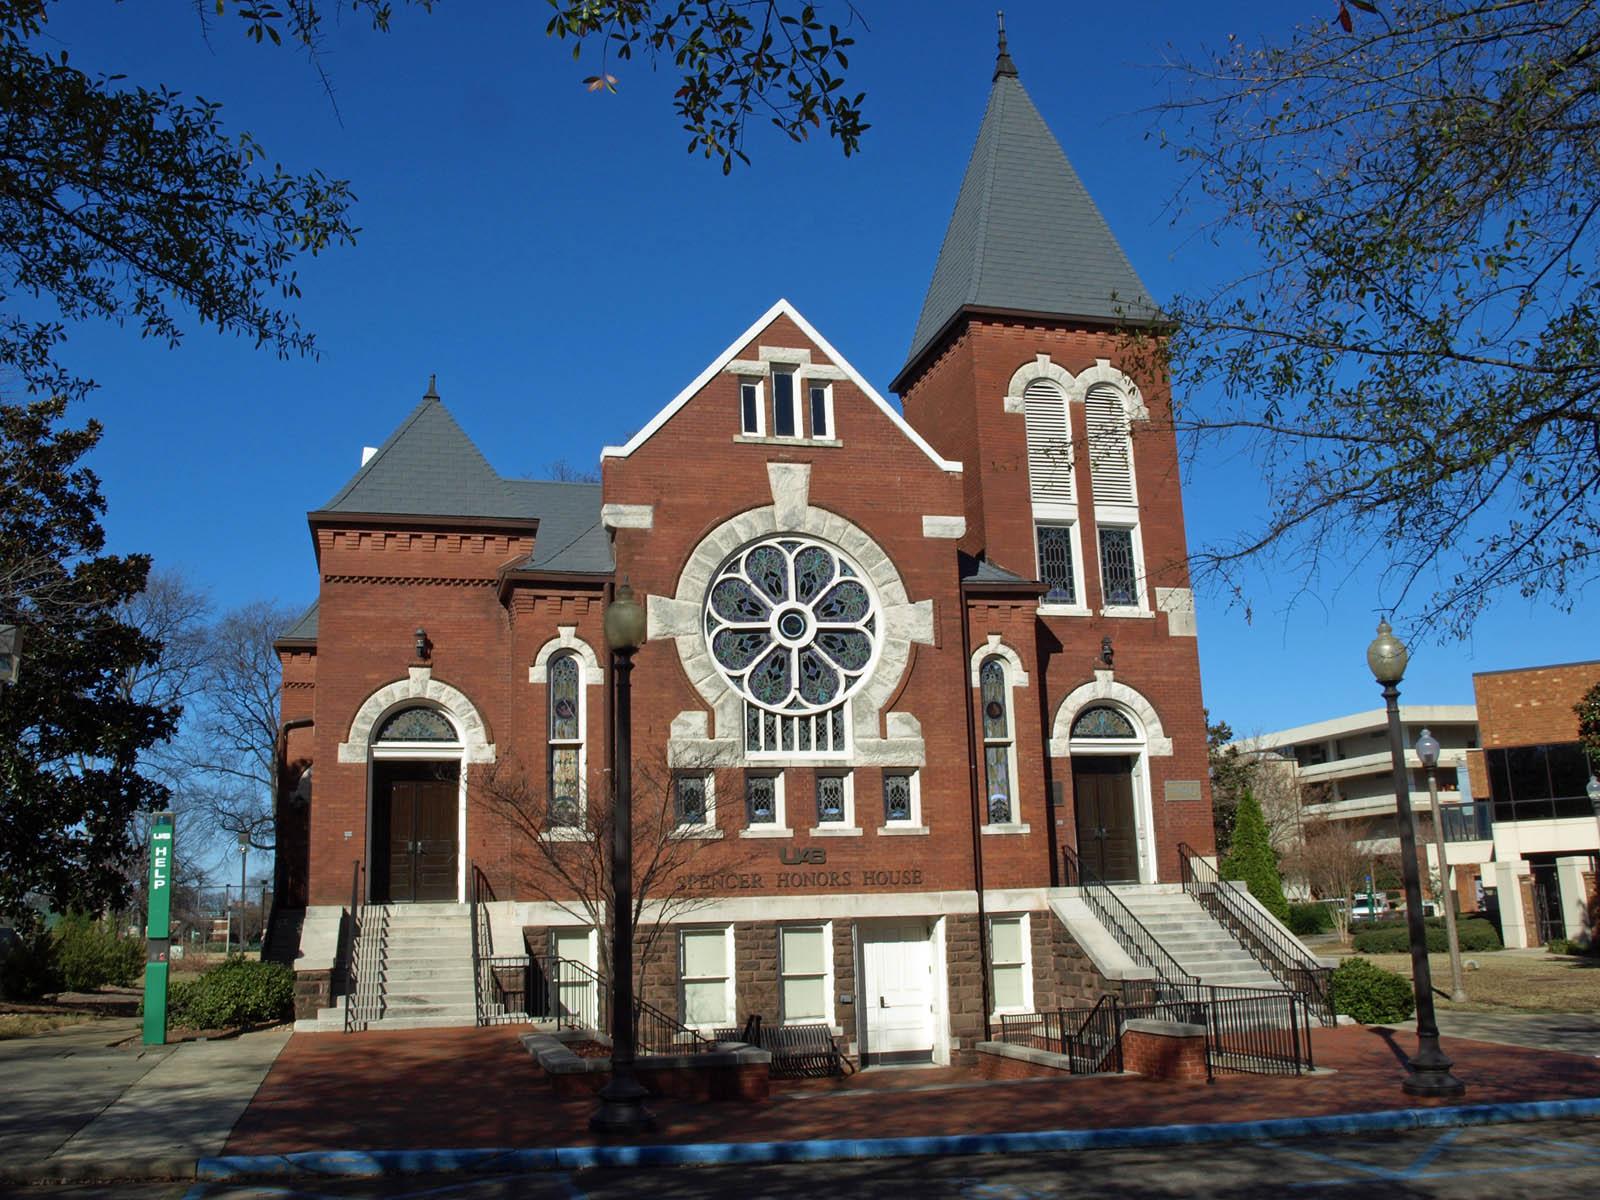 File:UAB Spencer Honors House Dec 2012 2.jpg - Wikimedia ...